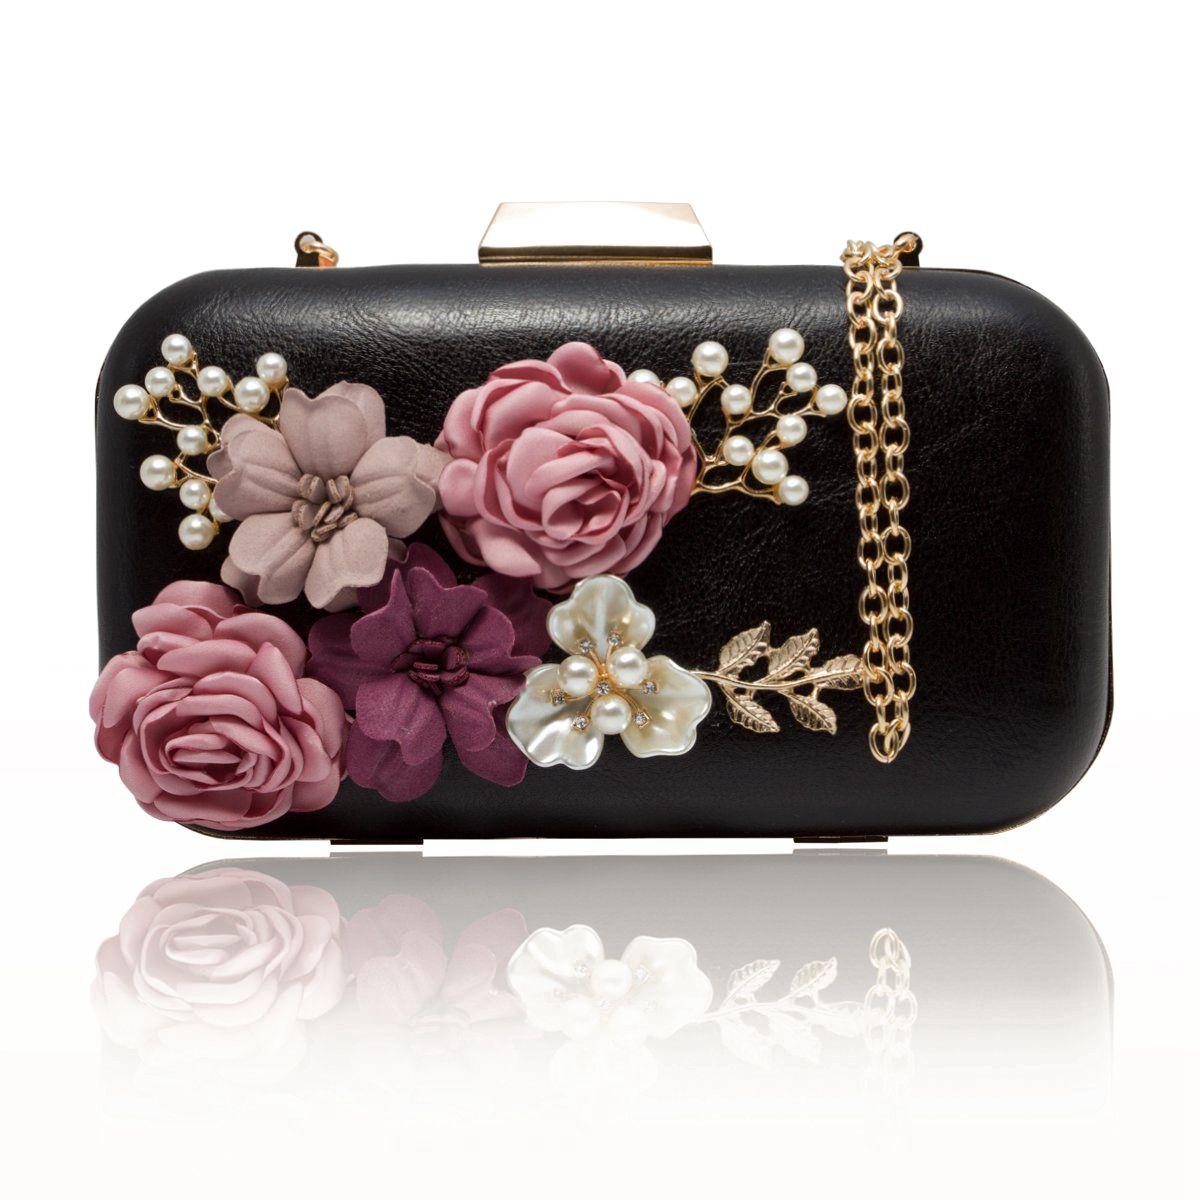 TFTP-Women Clutches Purses Bags Flower Leather Envelope Pearl Wallet Evening Handbag(Black)